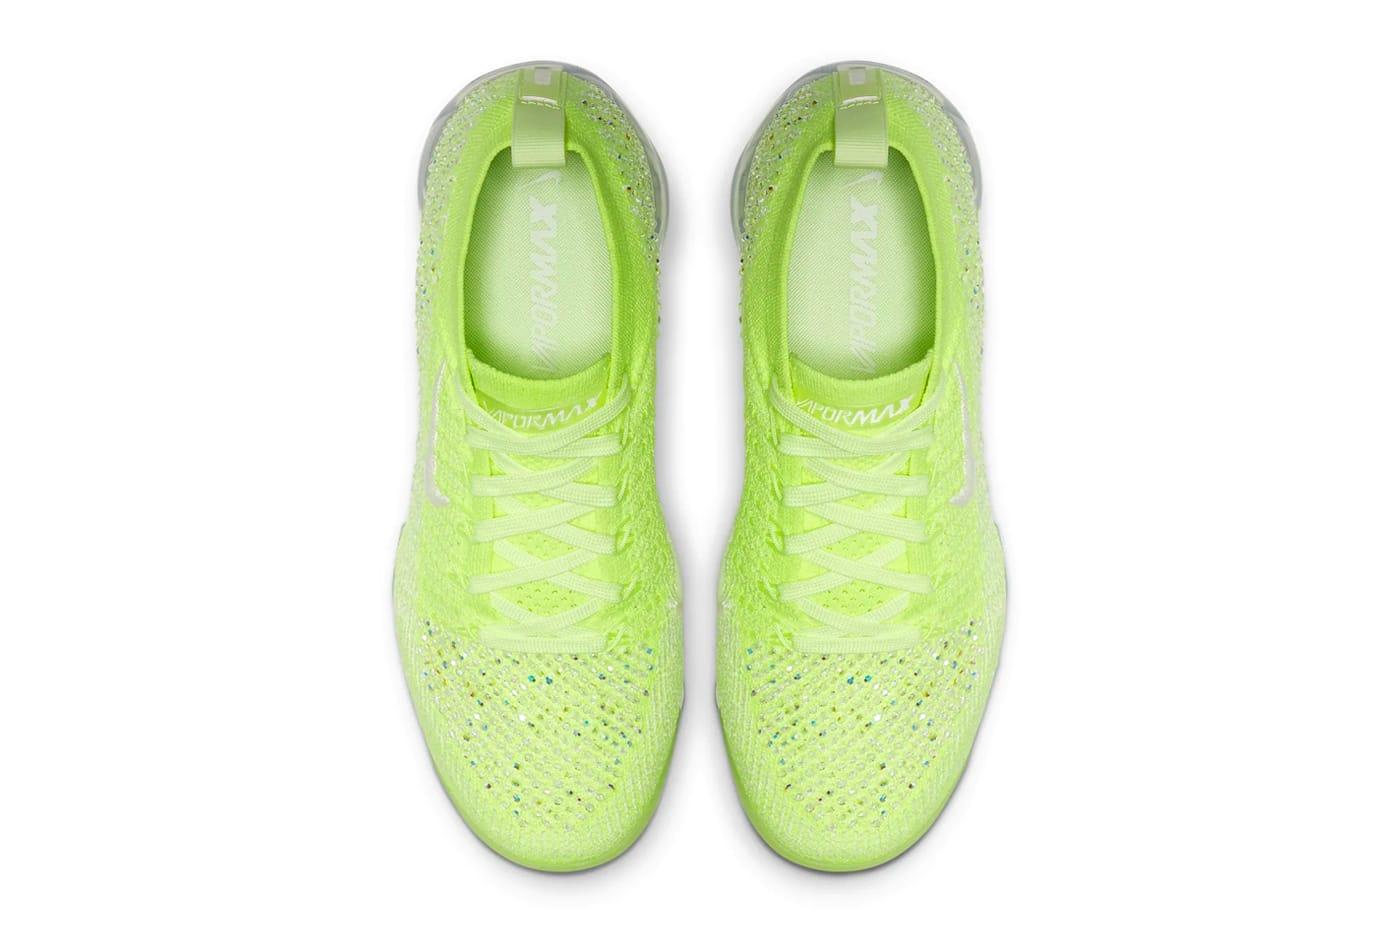 Nike x Swarovski Air VaporMax 2.0